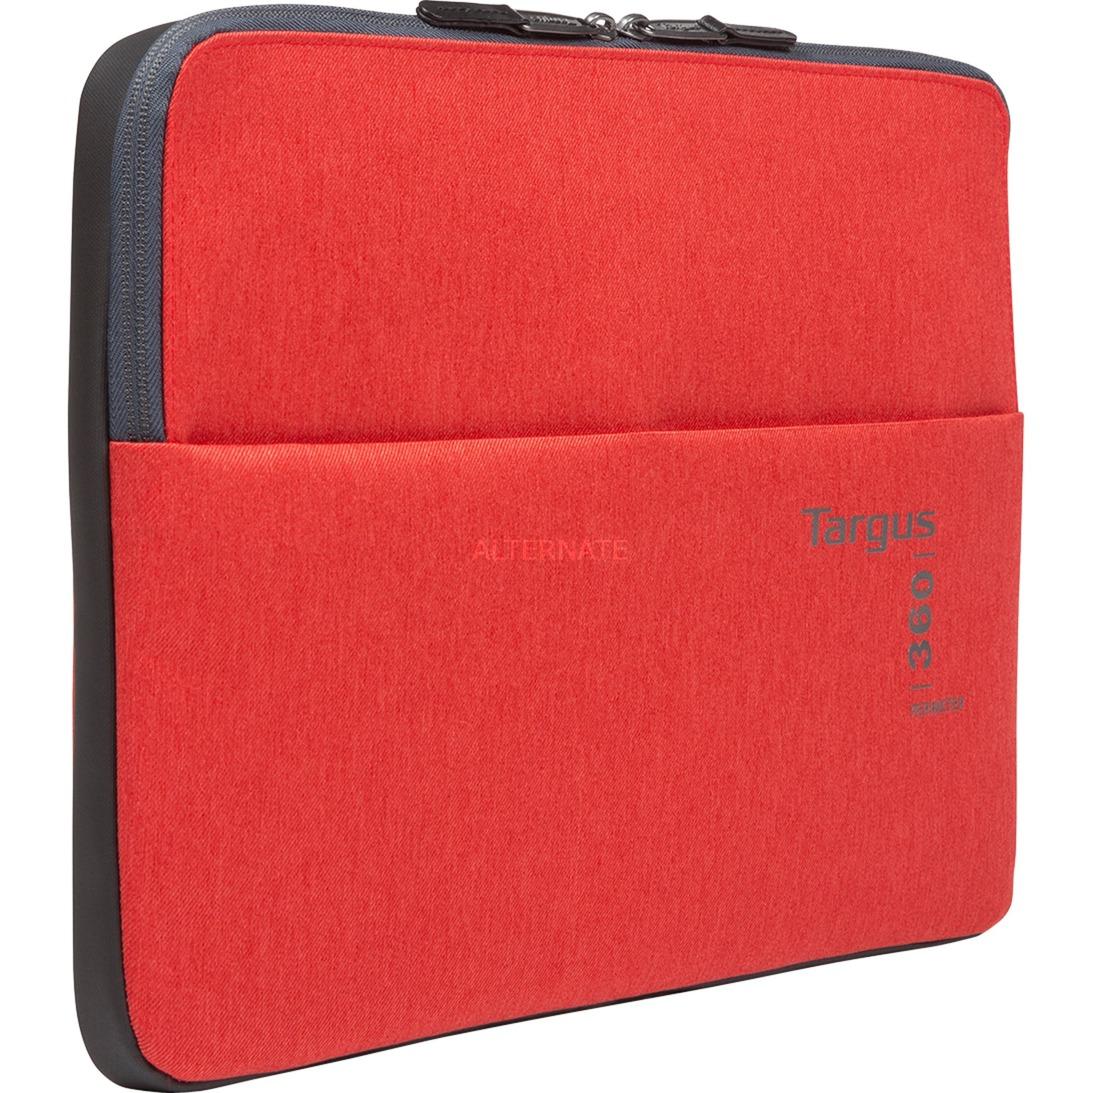 "360 Perimeter maletines para portátil 33,8 cm (13.3"") Funda Rojo, Bolsa"